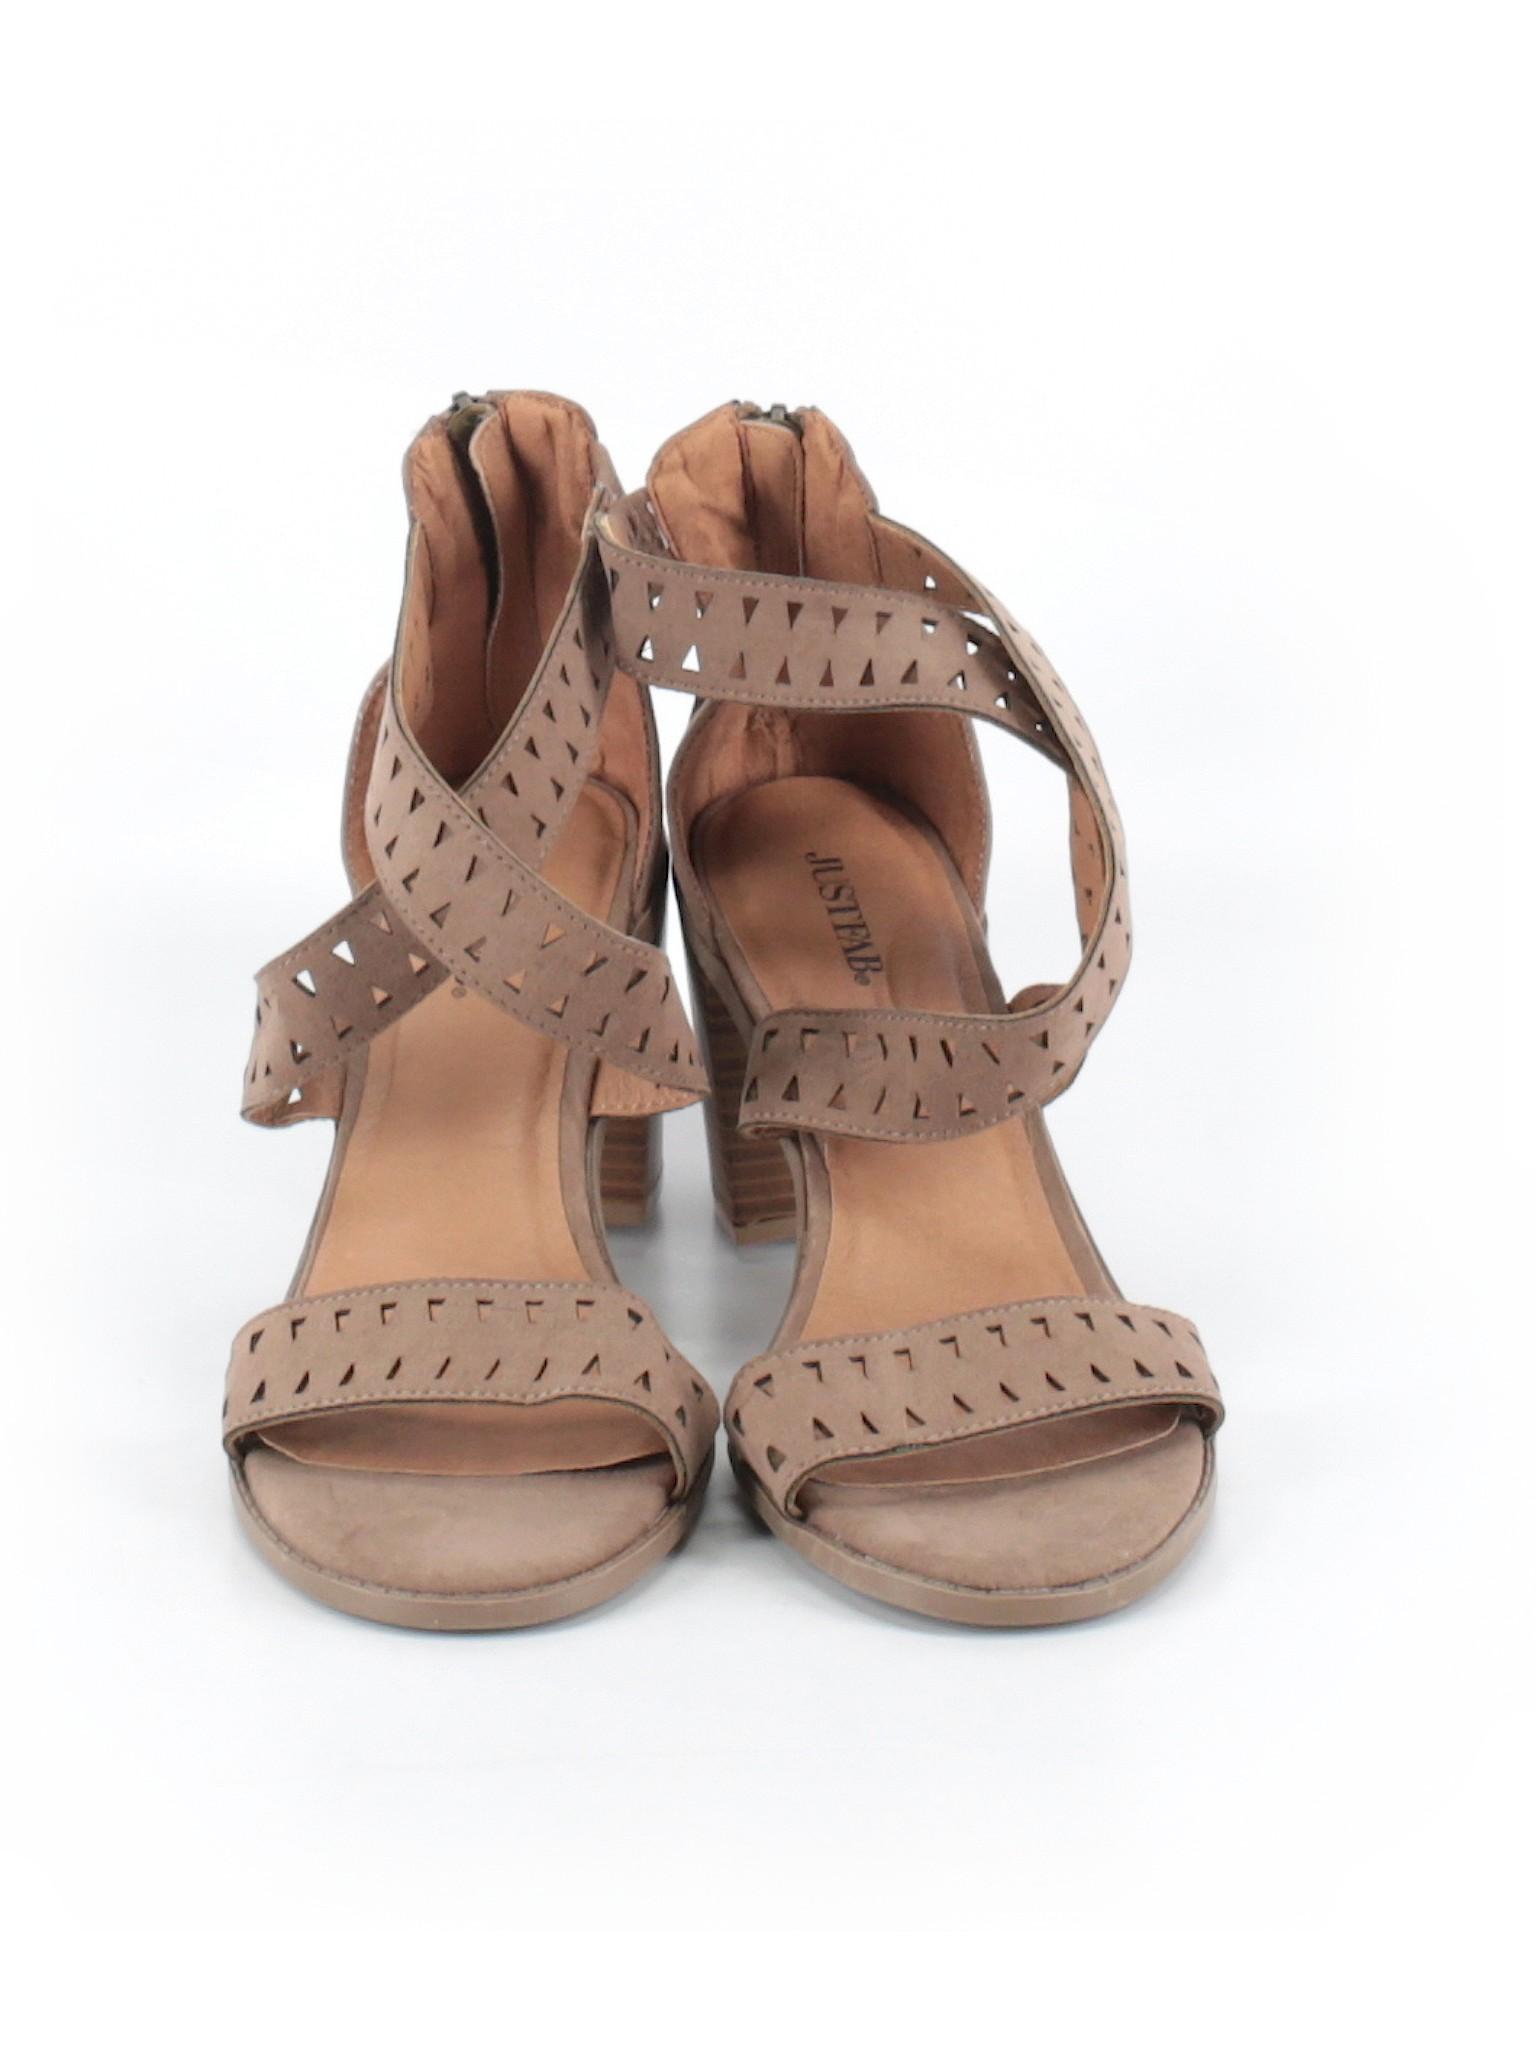 Boutique Heels Fab promotion promotion Boutique Just 7w6xq44Xd